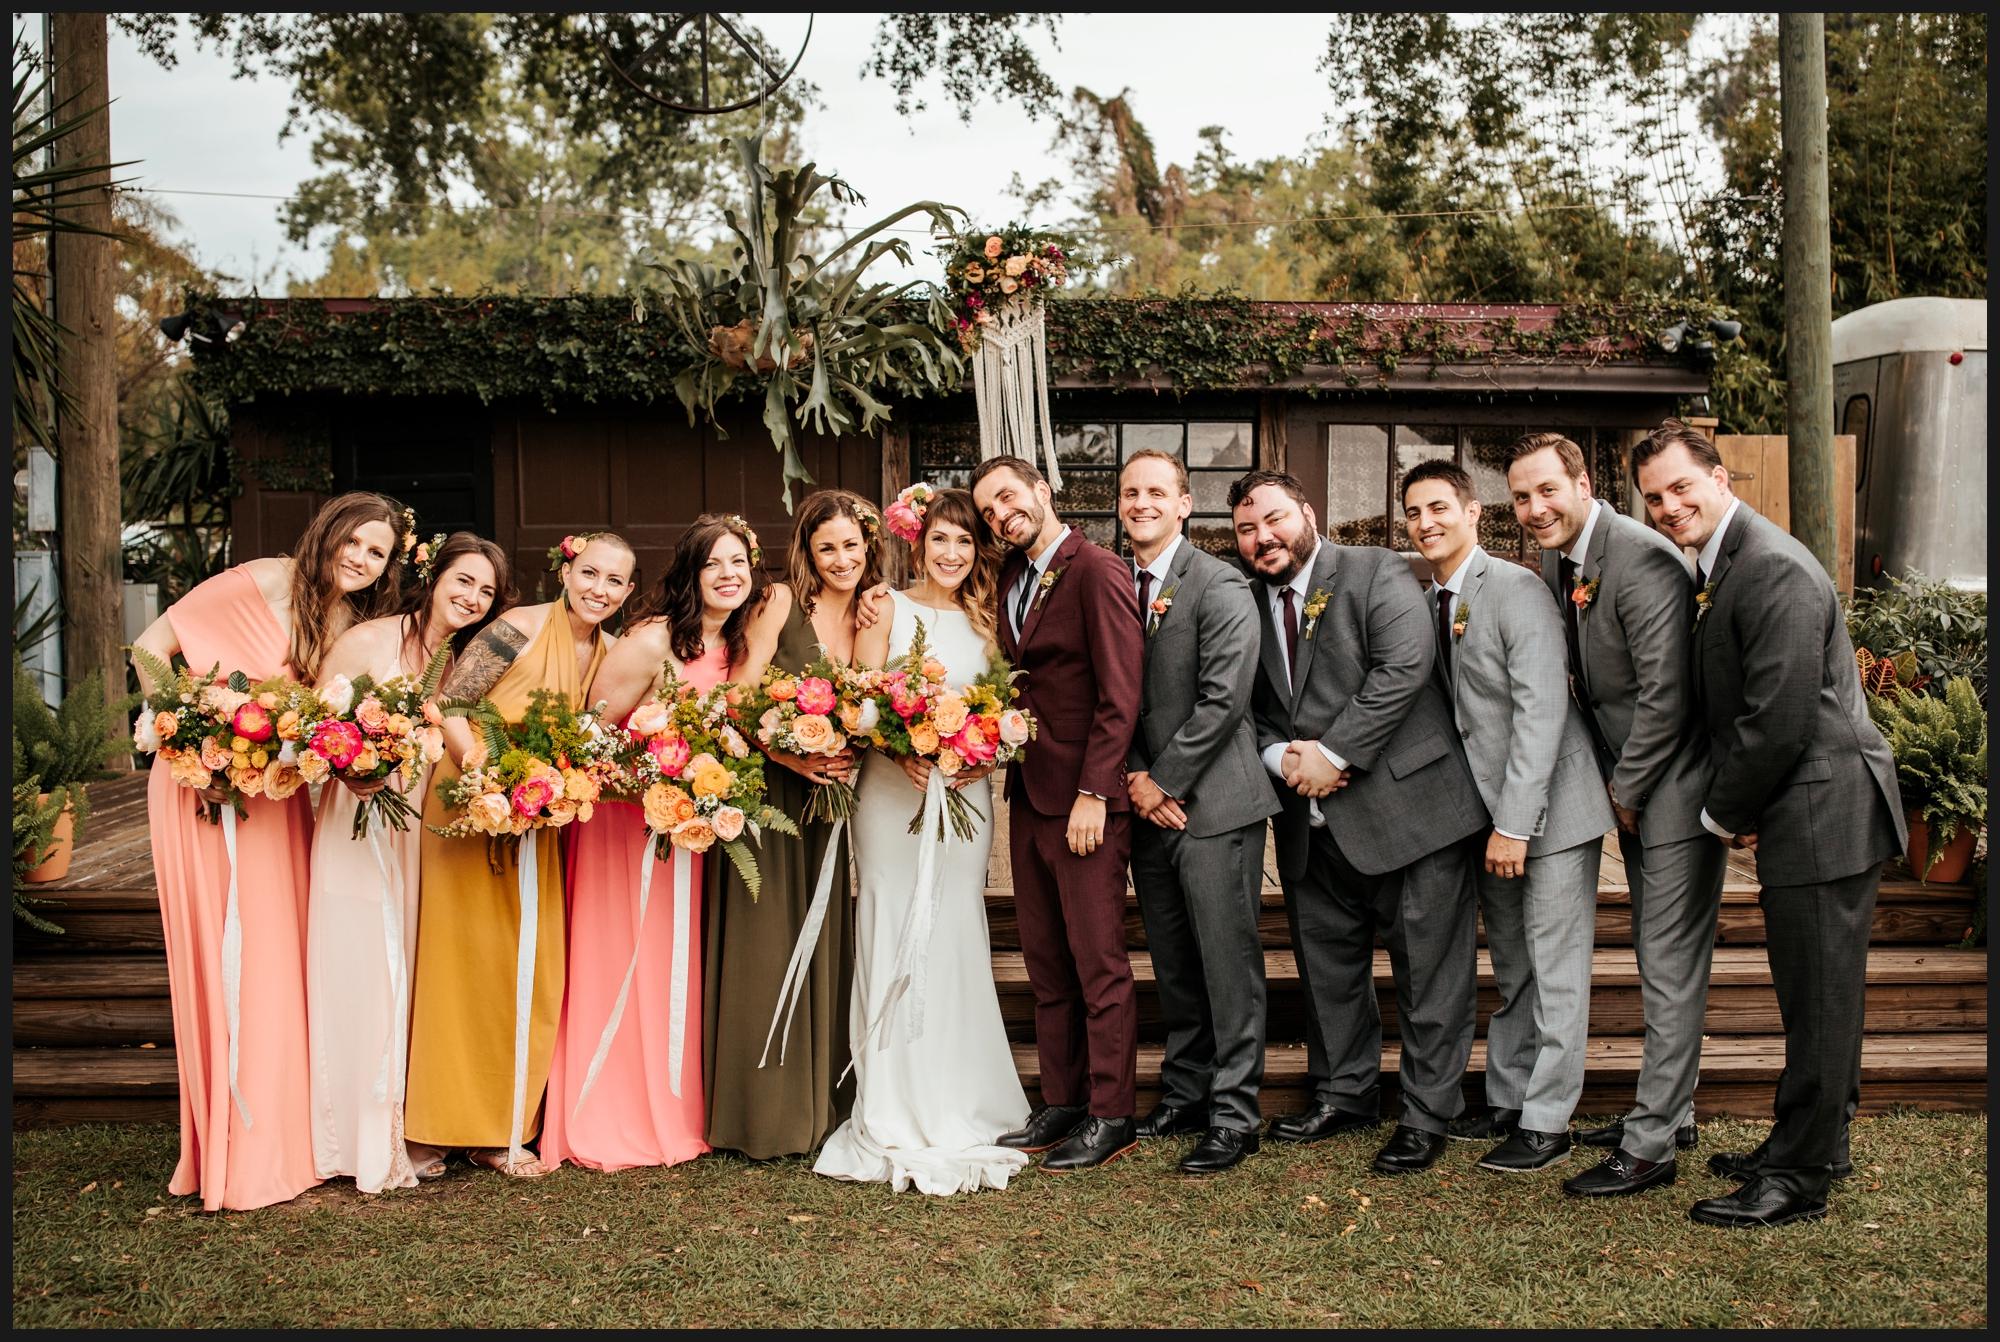 Orlando-Wedding-Photographer-destination-wedding-photographer-florida-wedding-photographer-bohemian-wedding-photographer_2014.jpg